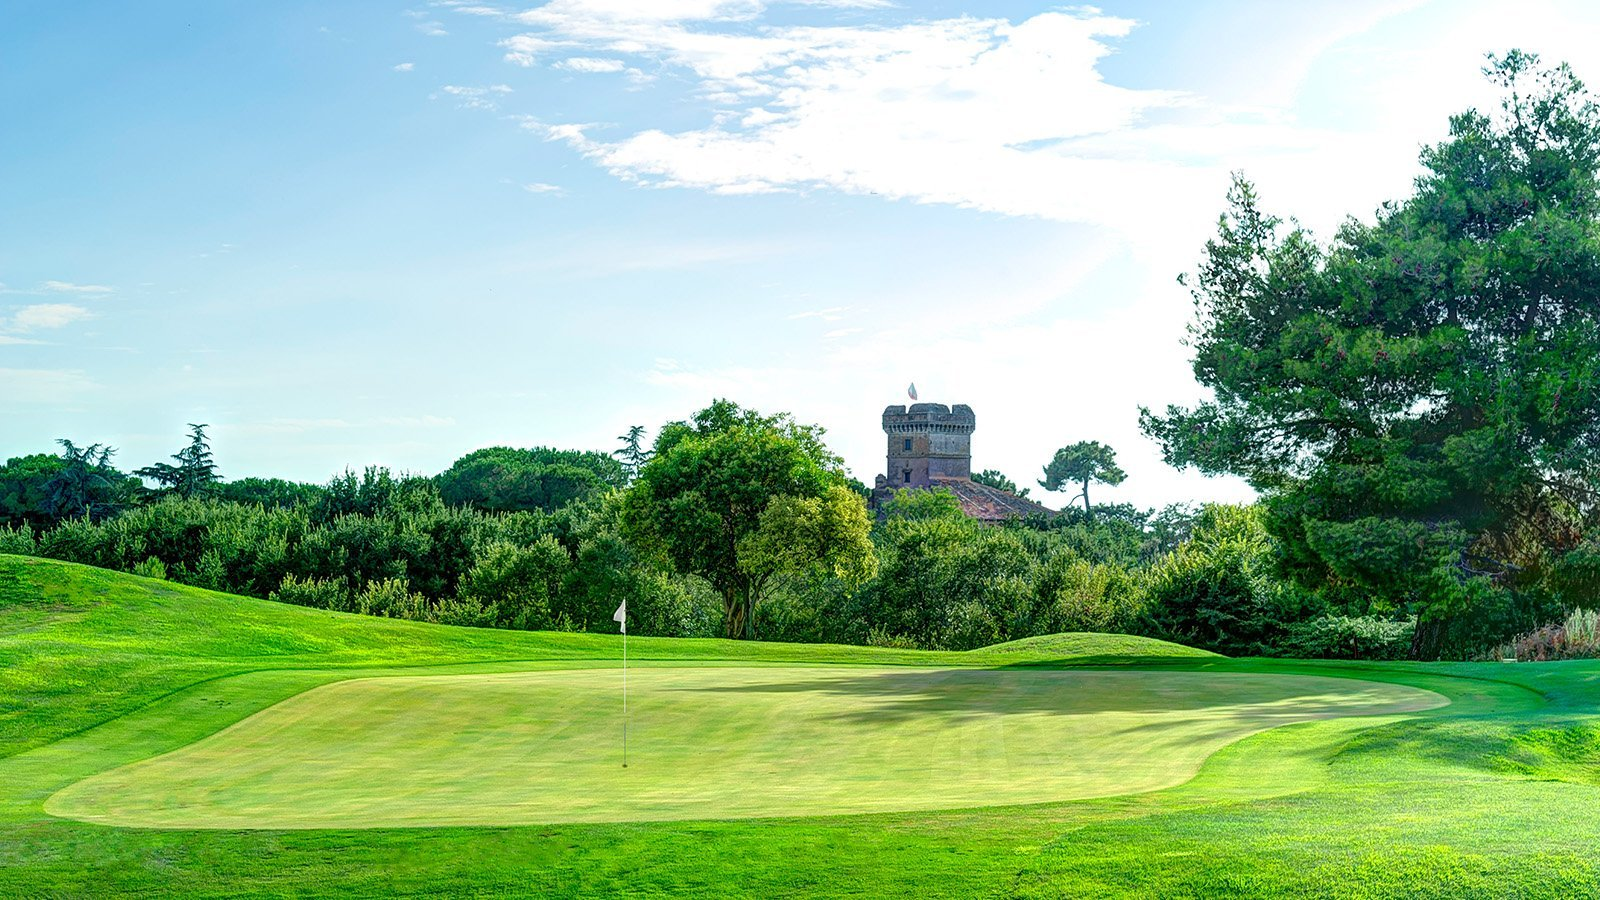 Marco Simone Golf & Country Club